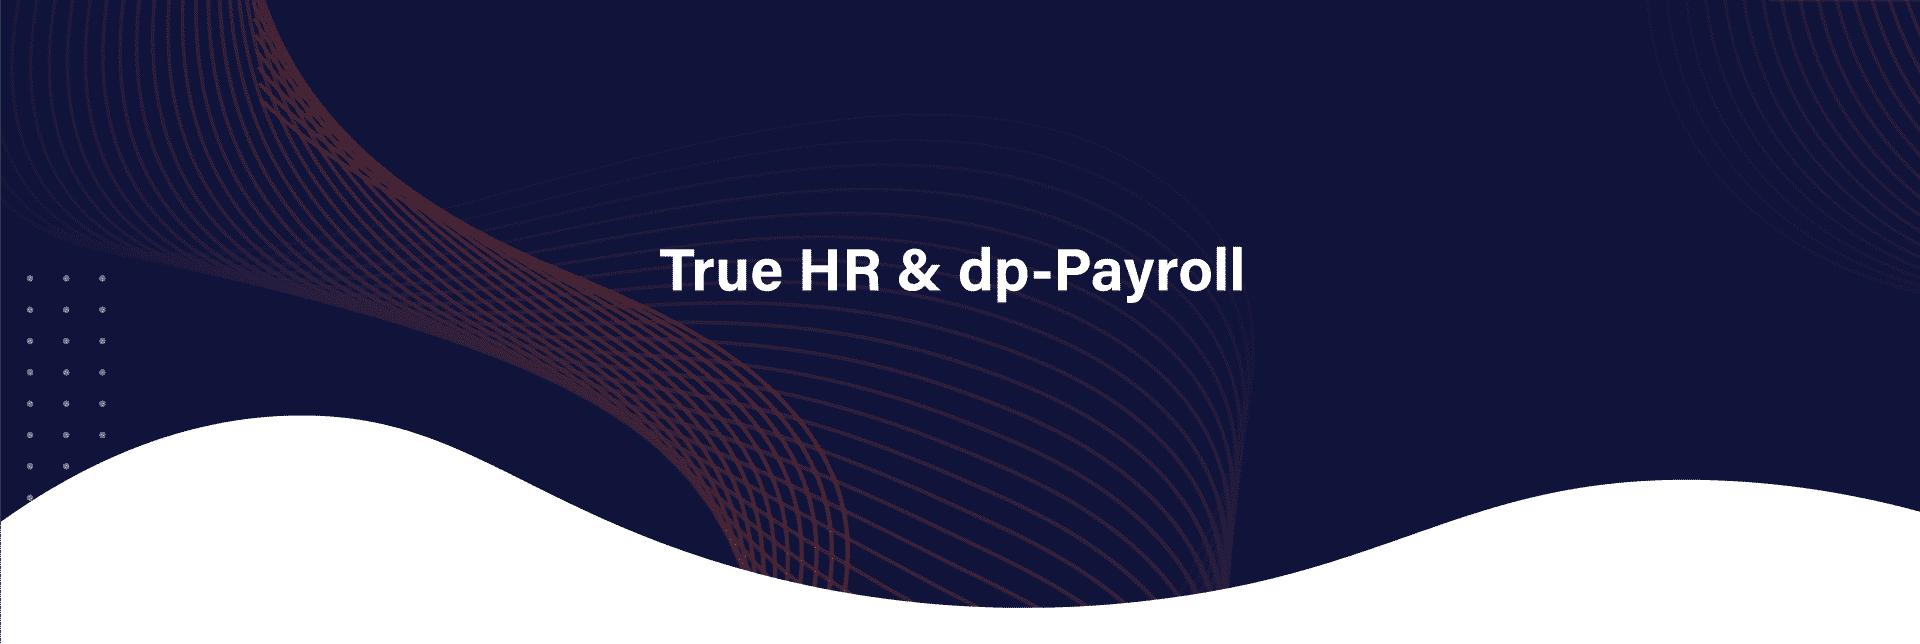 UCMS HR_TrueHR_dp-Payroll